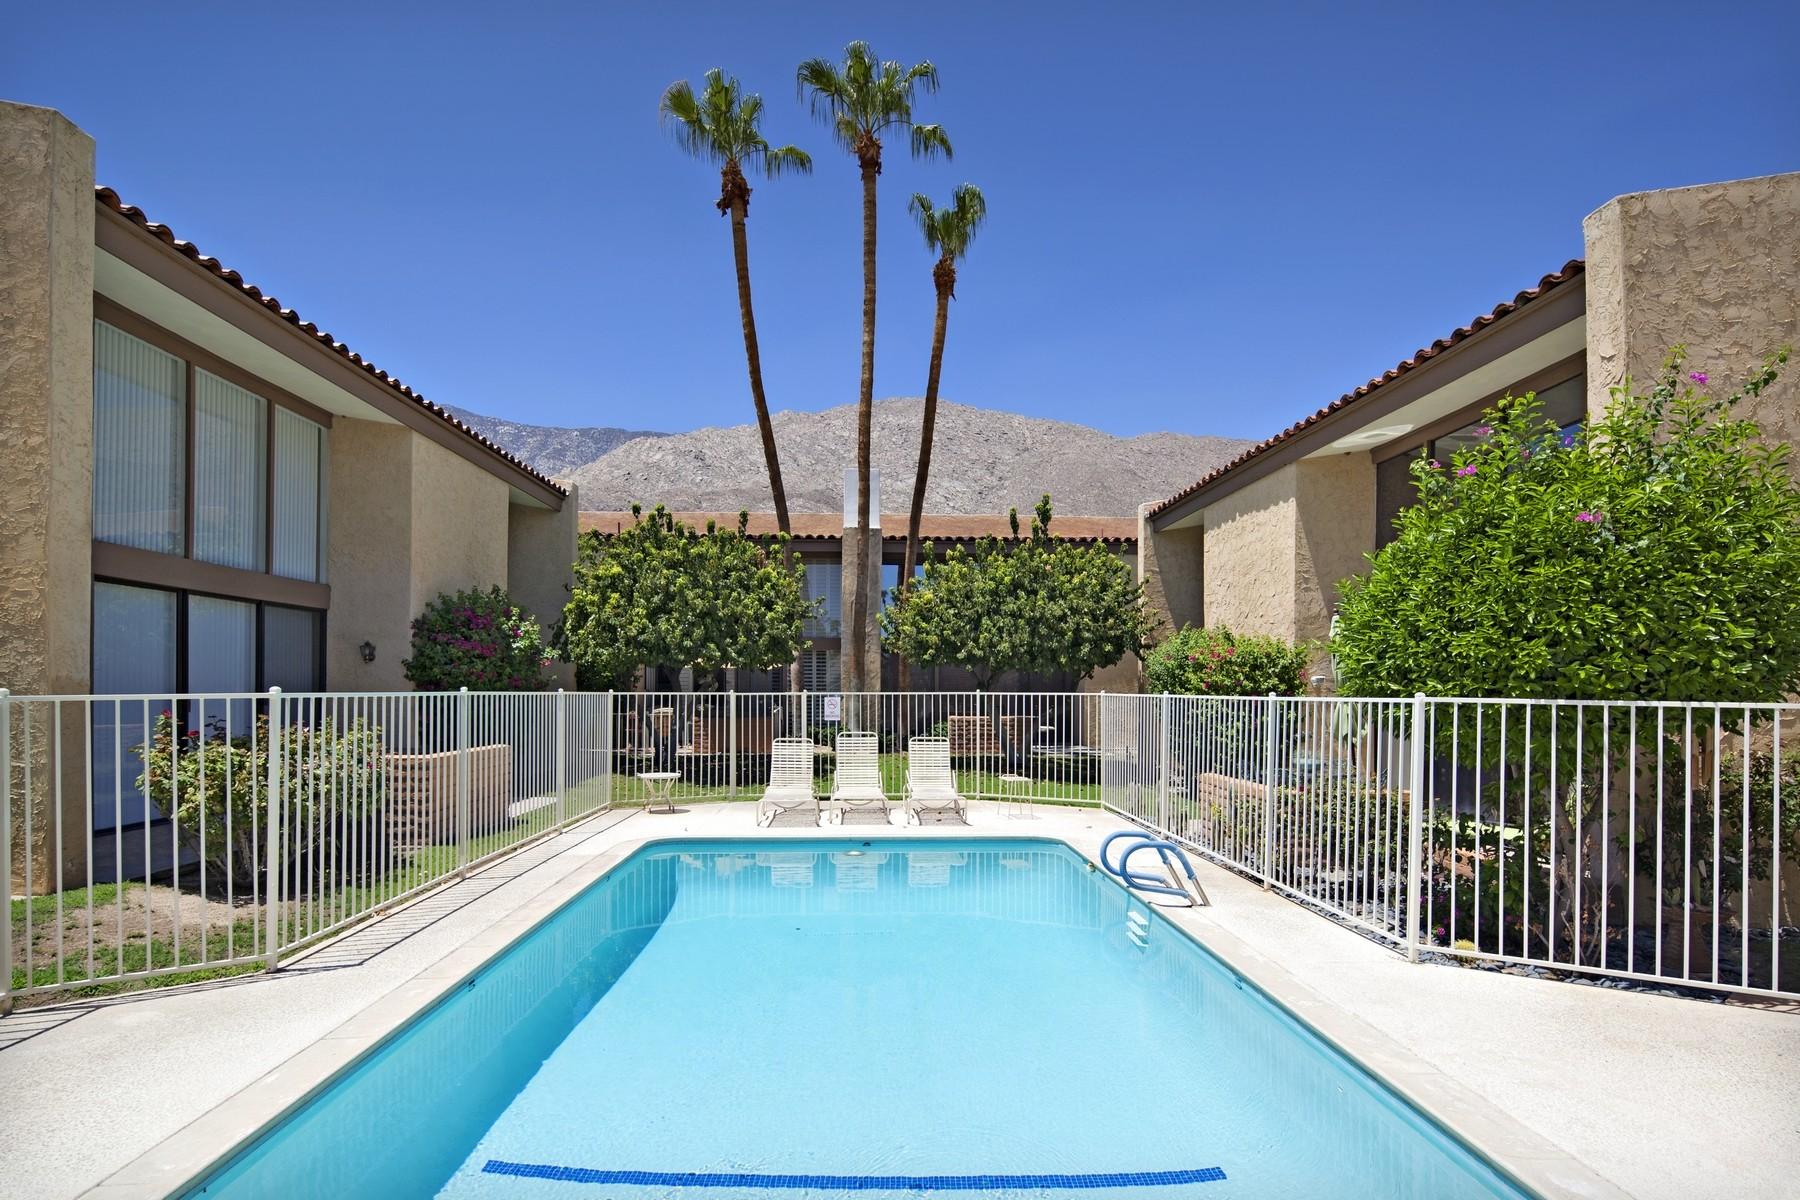 Condominium for Sale at 231 East La Verne Way #E Palm Springs, California 92264 United States